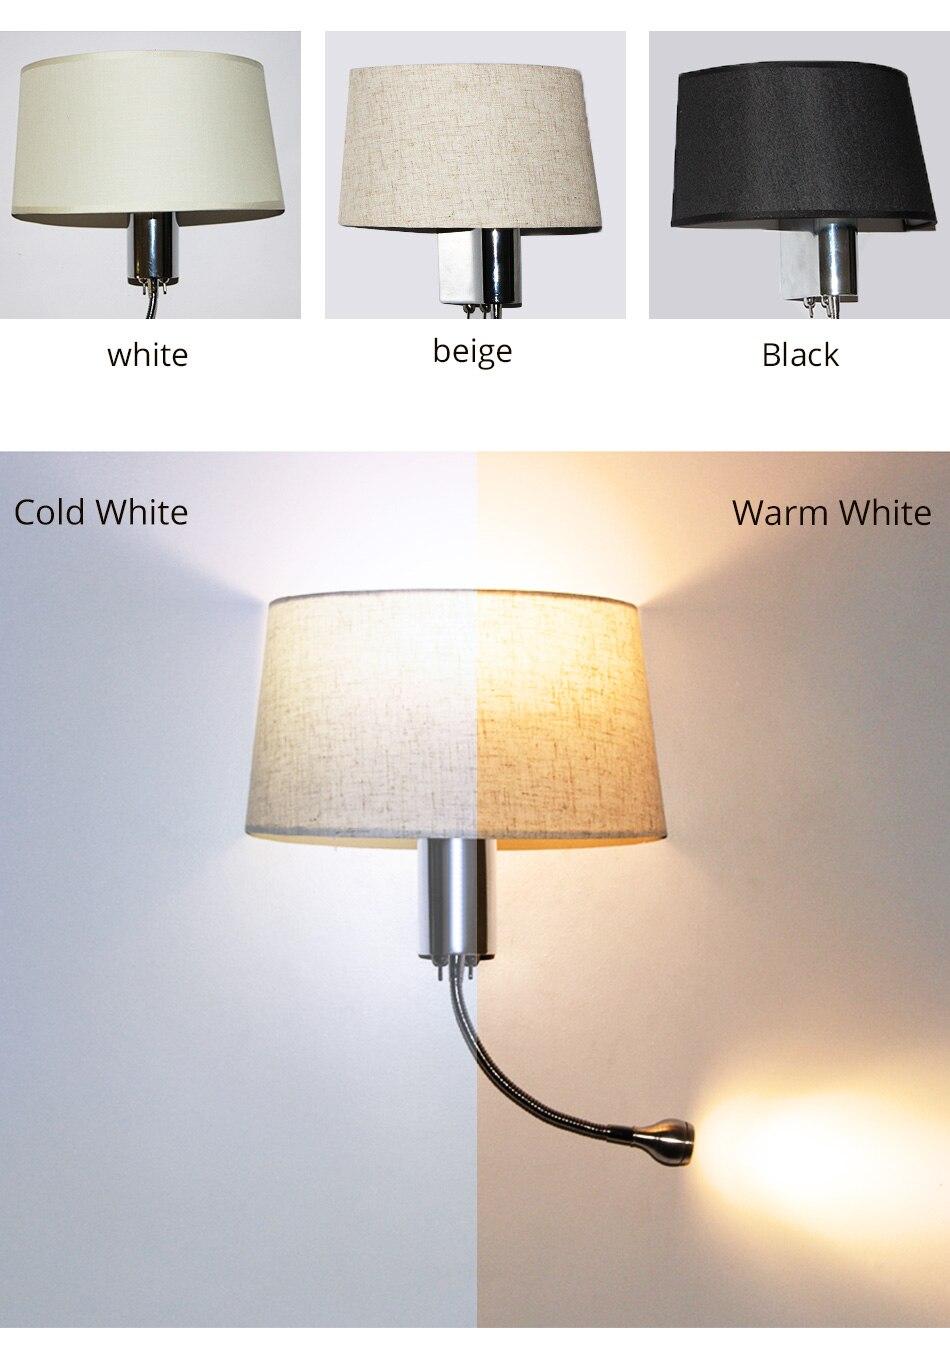 E27 Wall Lamp Modern Lighting Luminaires Bathroom Living Room Hotel Bedroom Loft Decorative Sconce Night Lighting LED Wall Light (7)